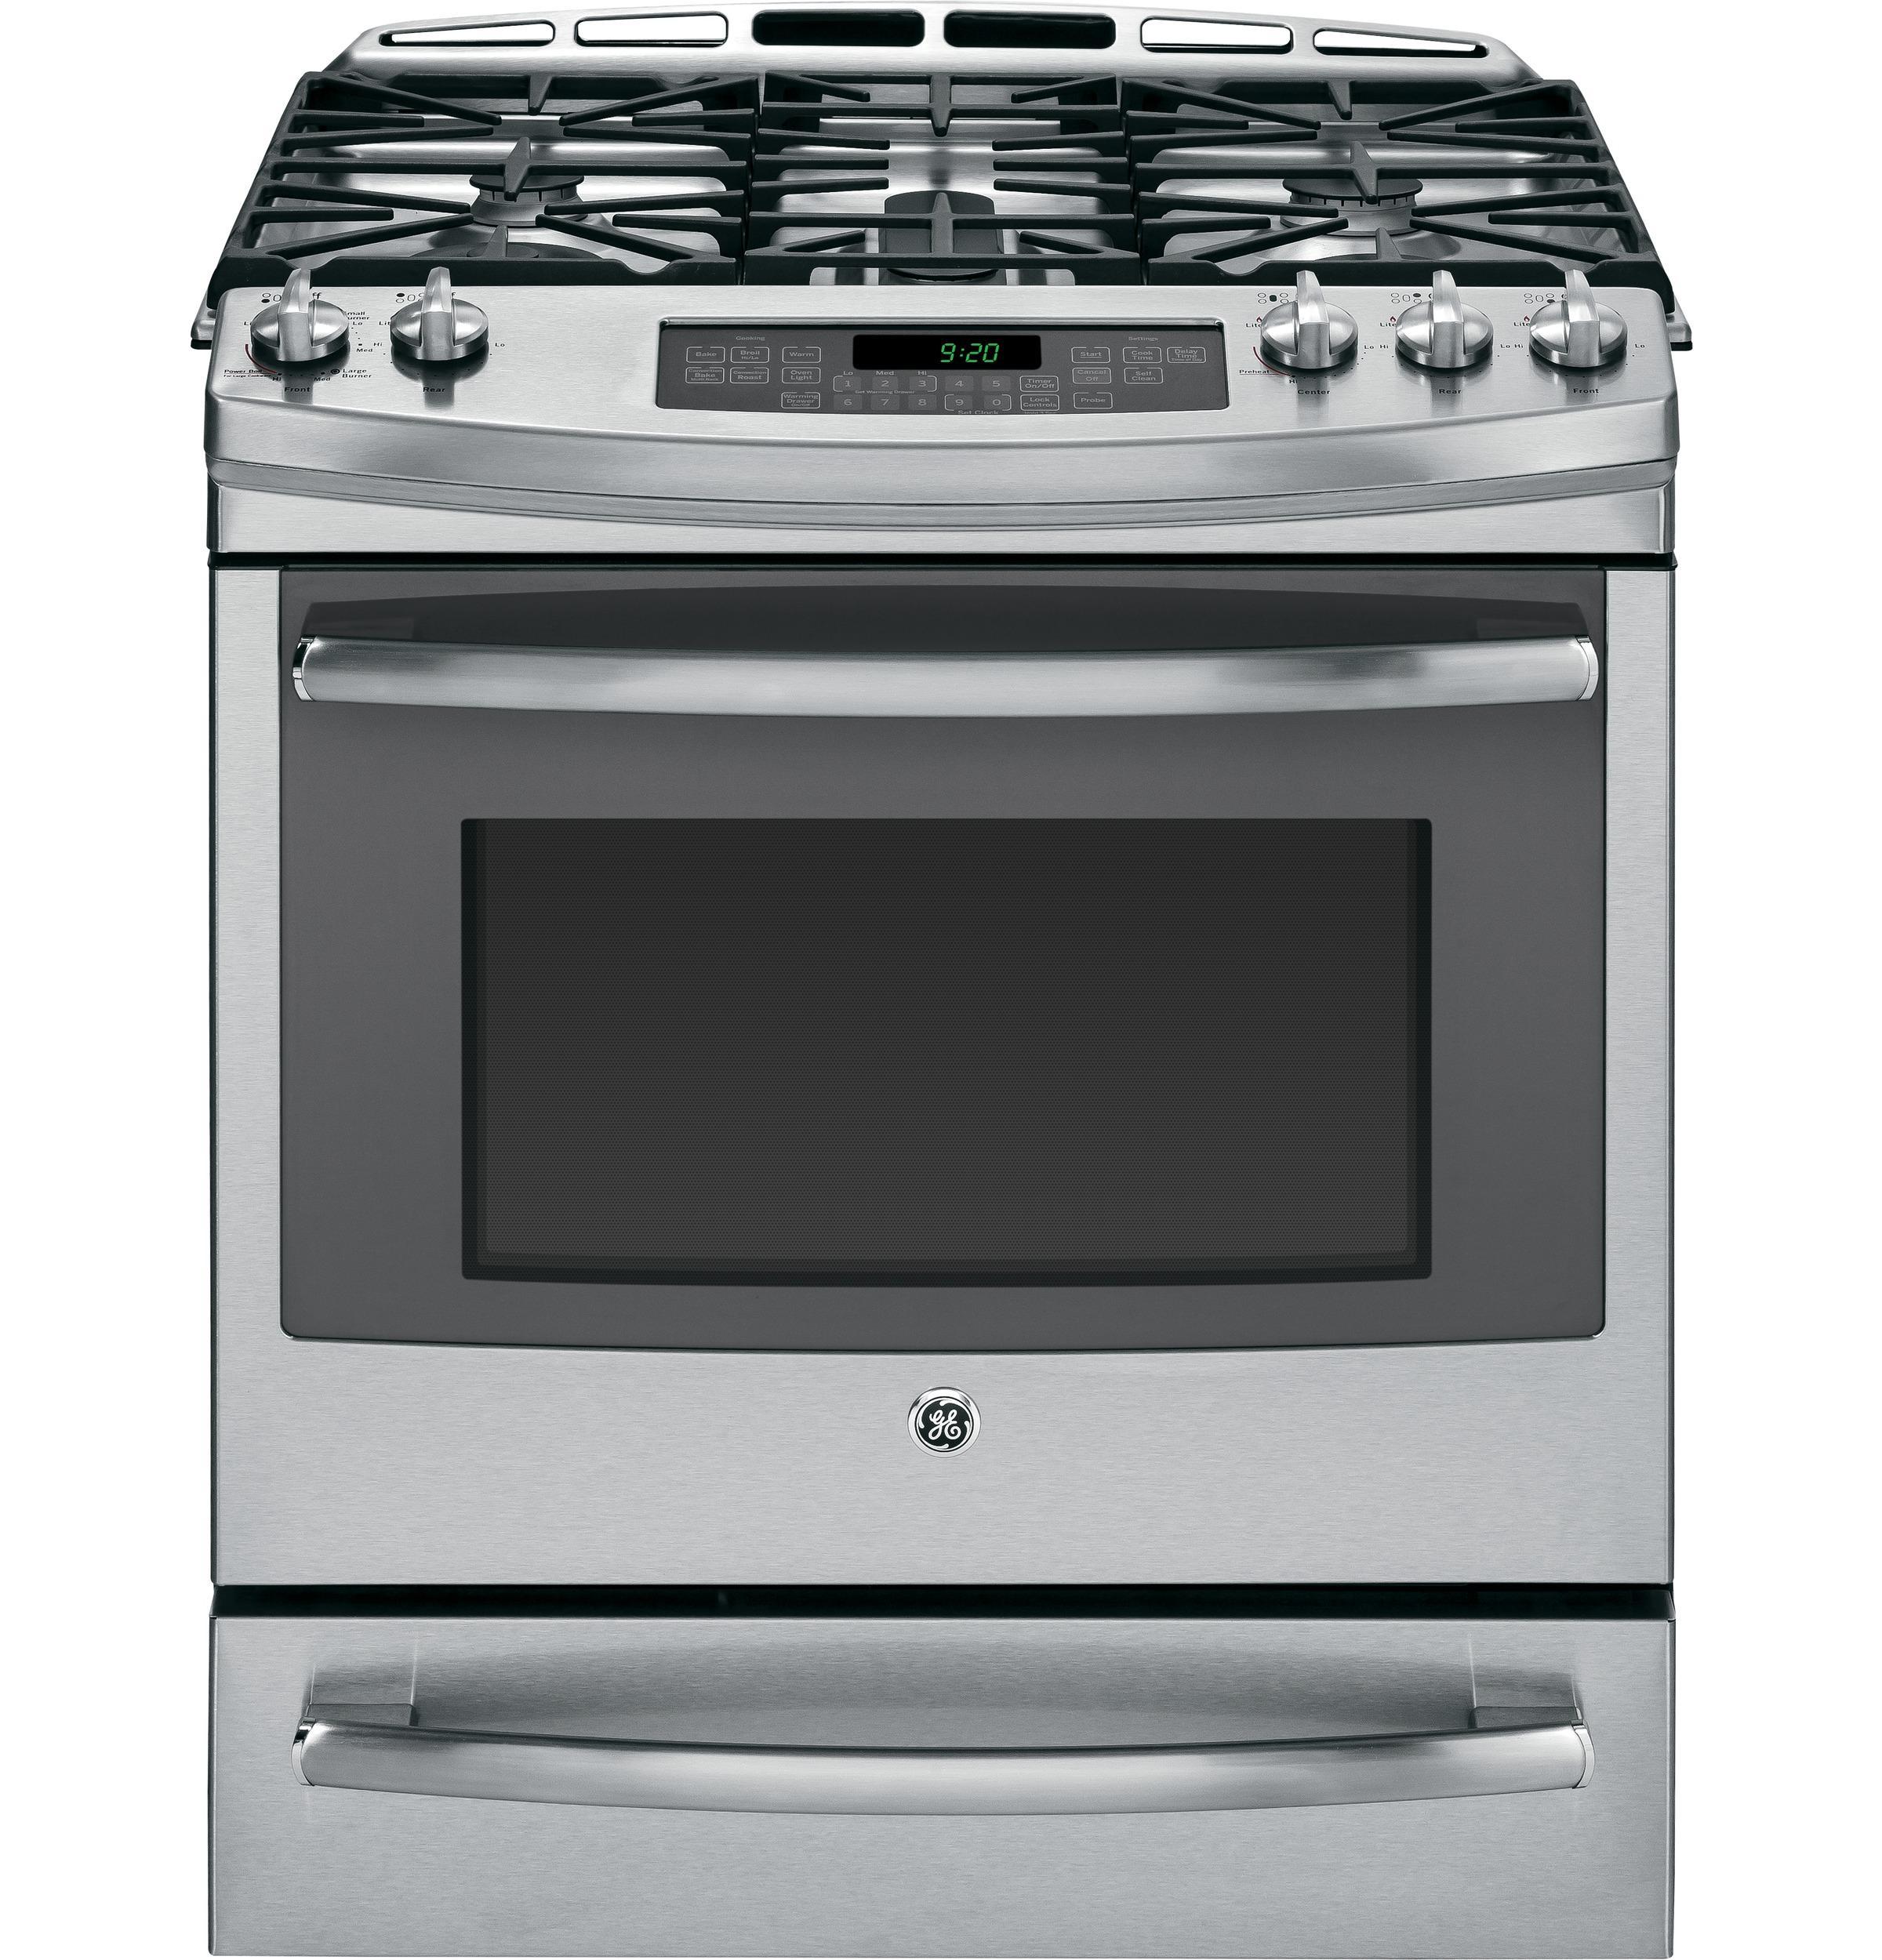 "GE Appliances Dual-Fuel Ranges 30"" Dual Fuel Slide-In Range - Item Number: P2S920SEFSS"